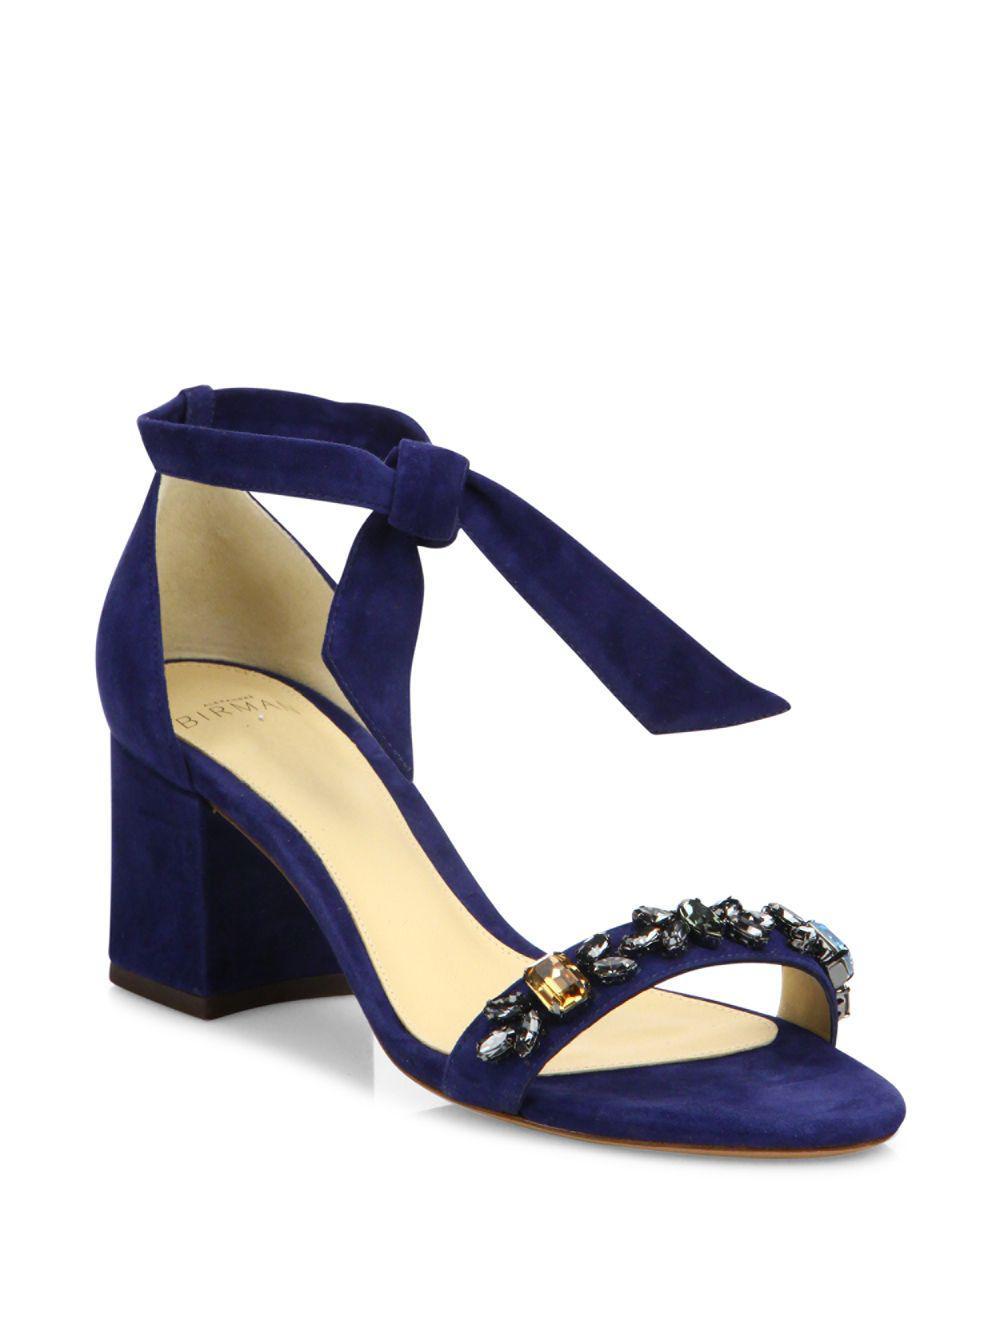 91c98d81bab Lyst - Alexandre Birman Clarita Jeweled Suede Block Heel Sandals in Blue